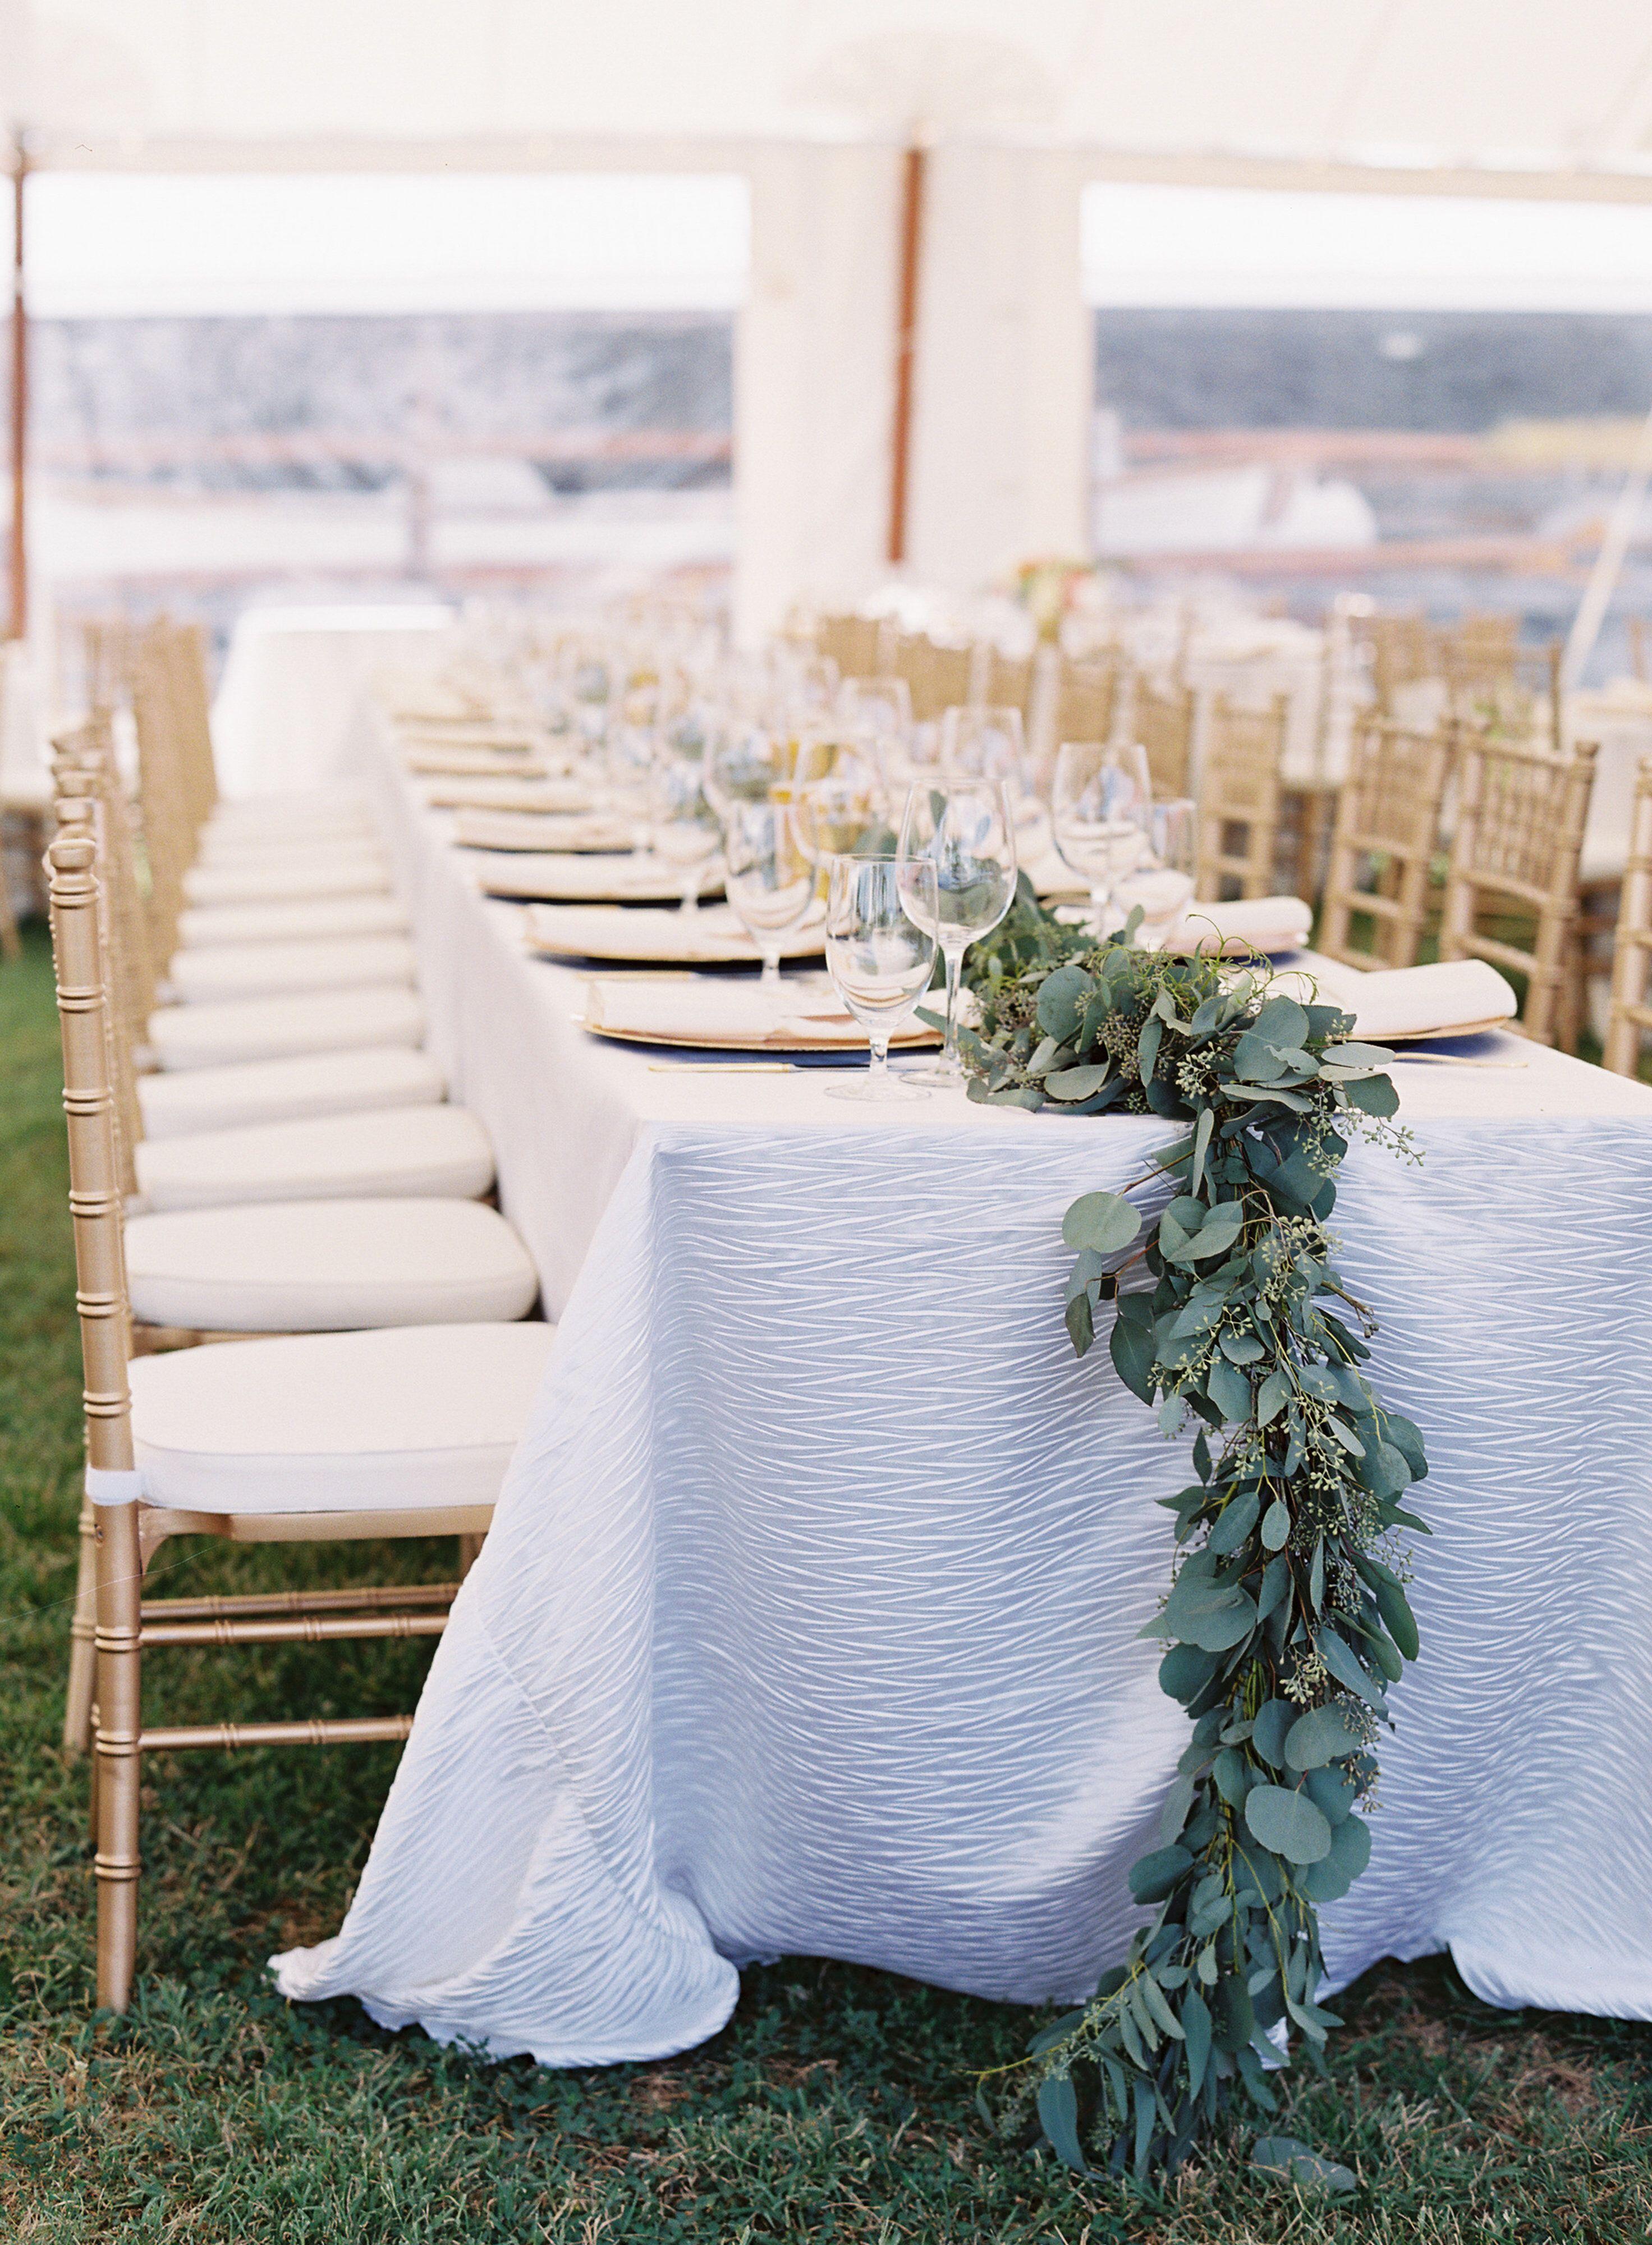 Wedding ideas for summer  Summer Sun  Pretty Pastels for this Seaside Wedding  Wedding ideas